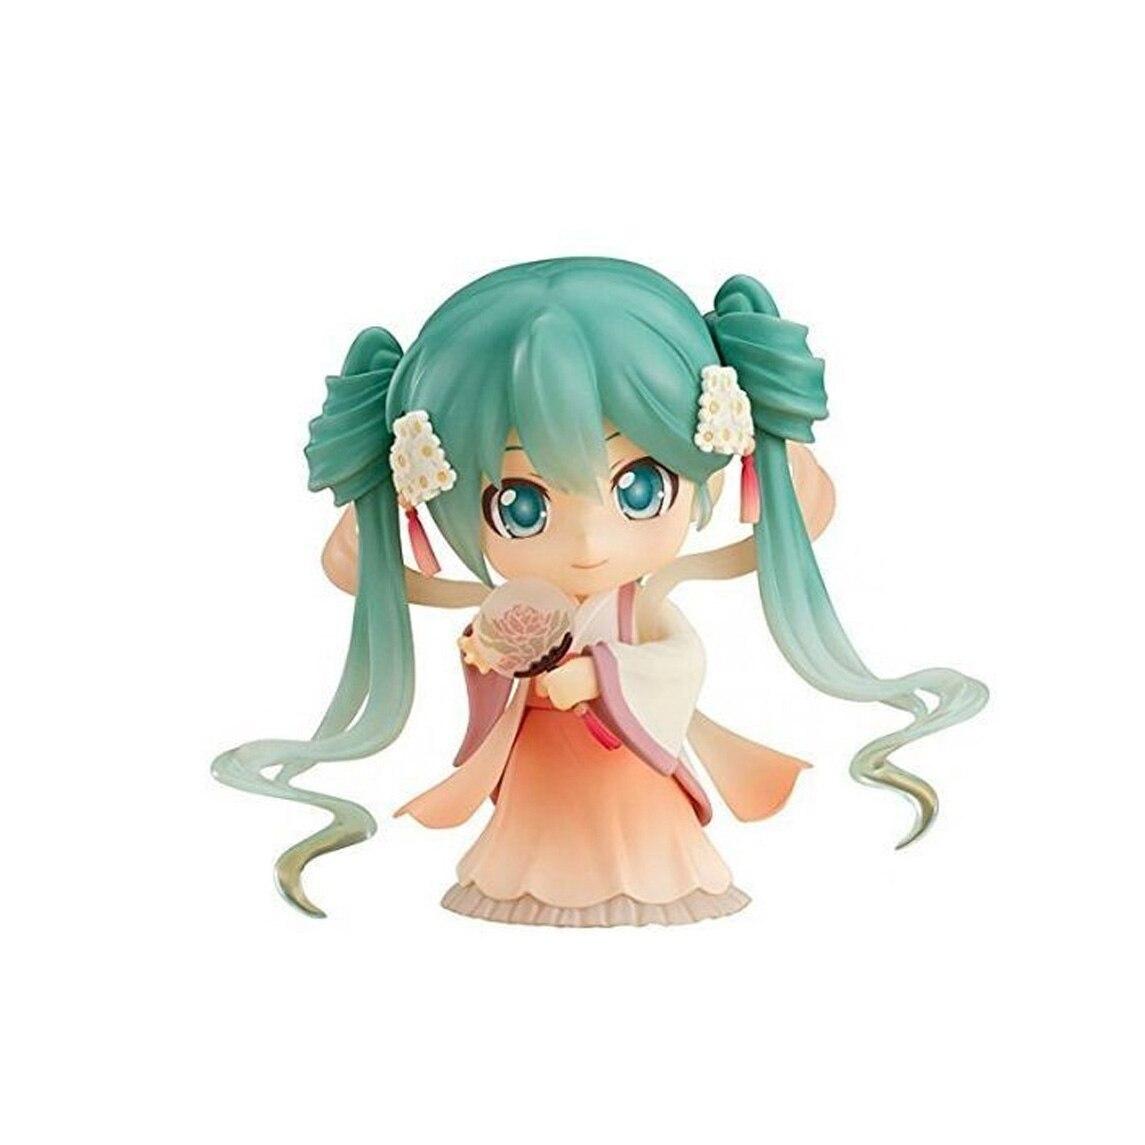 Chanycore GSC Nendoroid #539 Harvest moon ver Hatsune Miku Sakura Miku PVC Action Figure Collection Model Toy 10cm 4'' cxhexin g10a gu10 10w 600lm 20 5630 led dimmable light lamp bulb white golden ac 85 265v